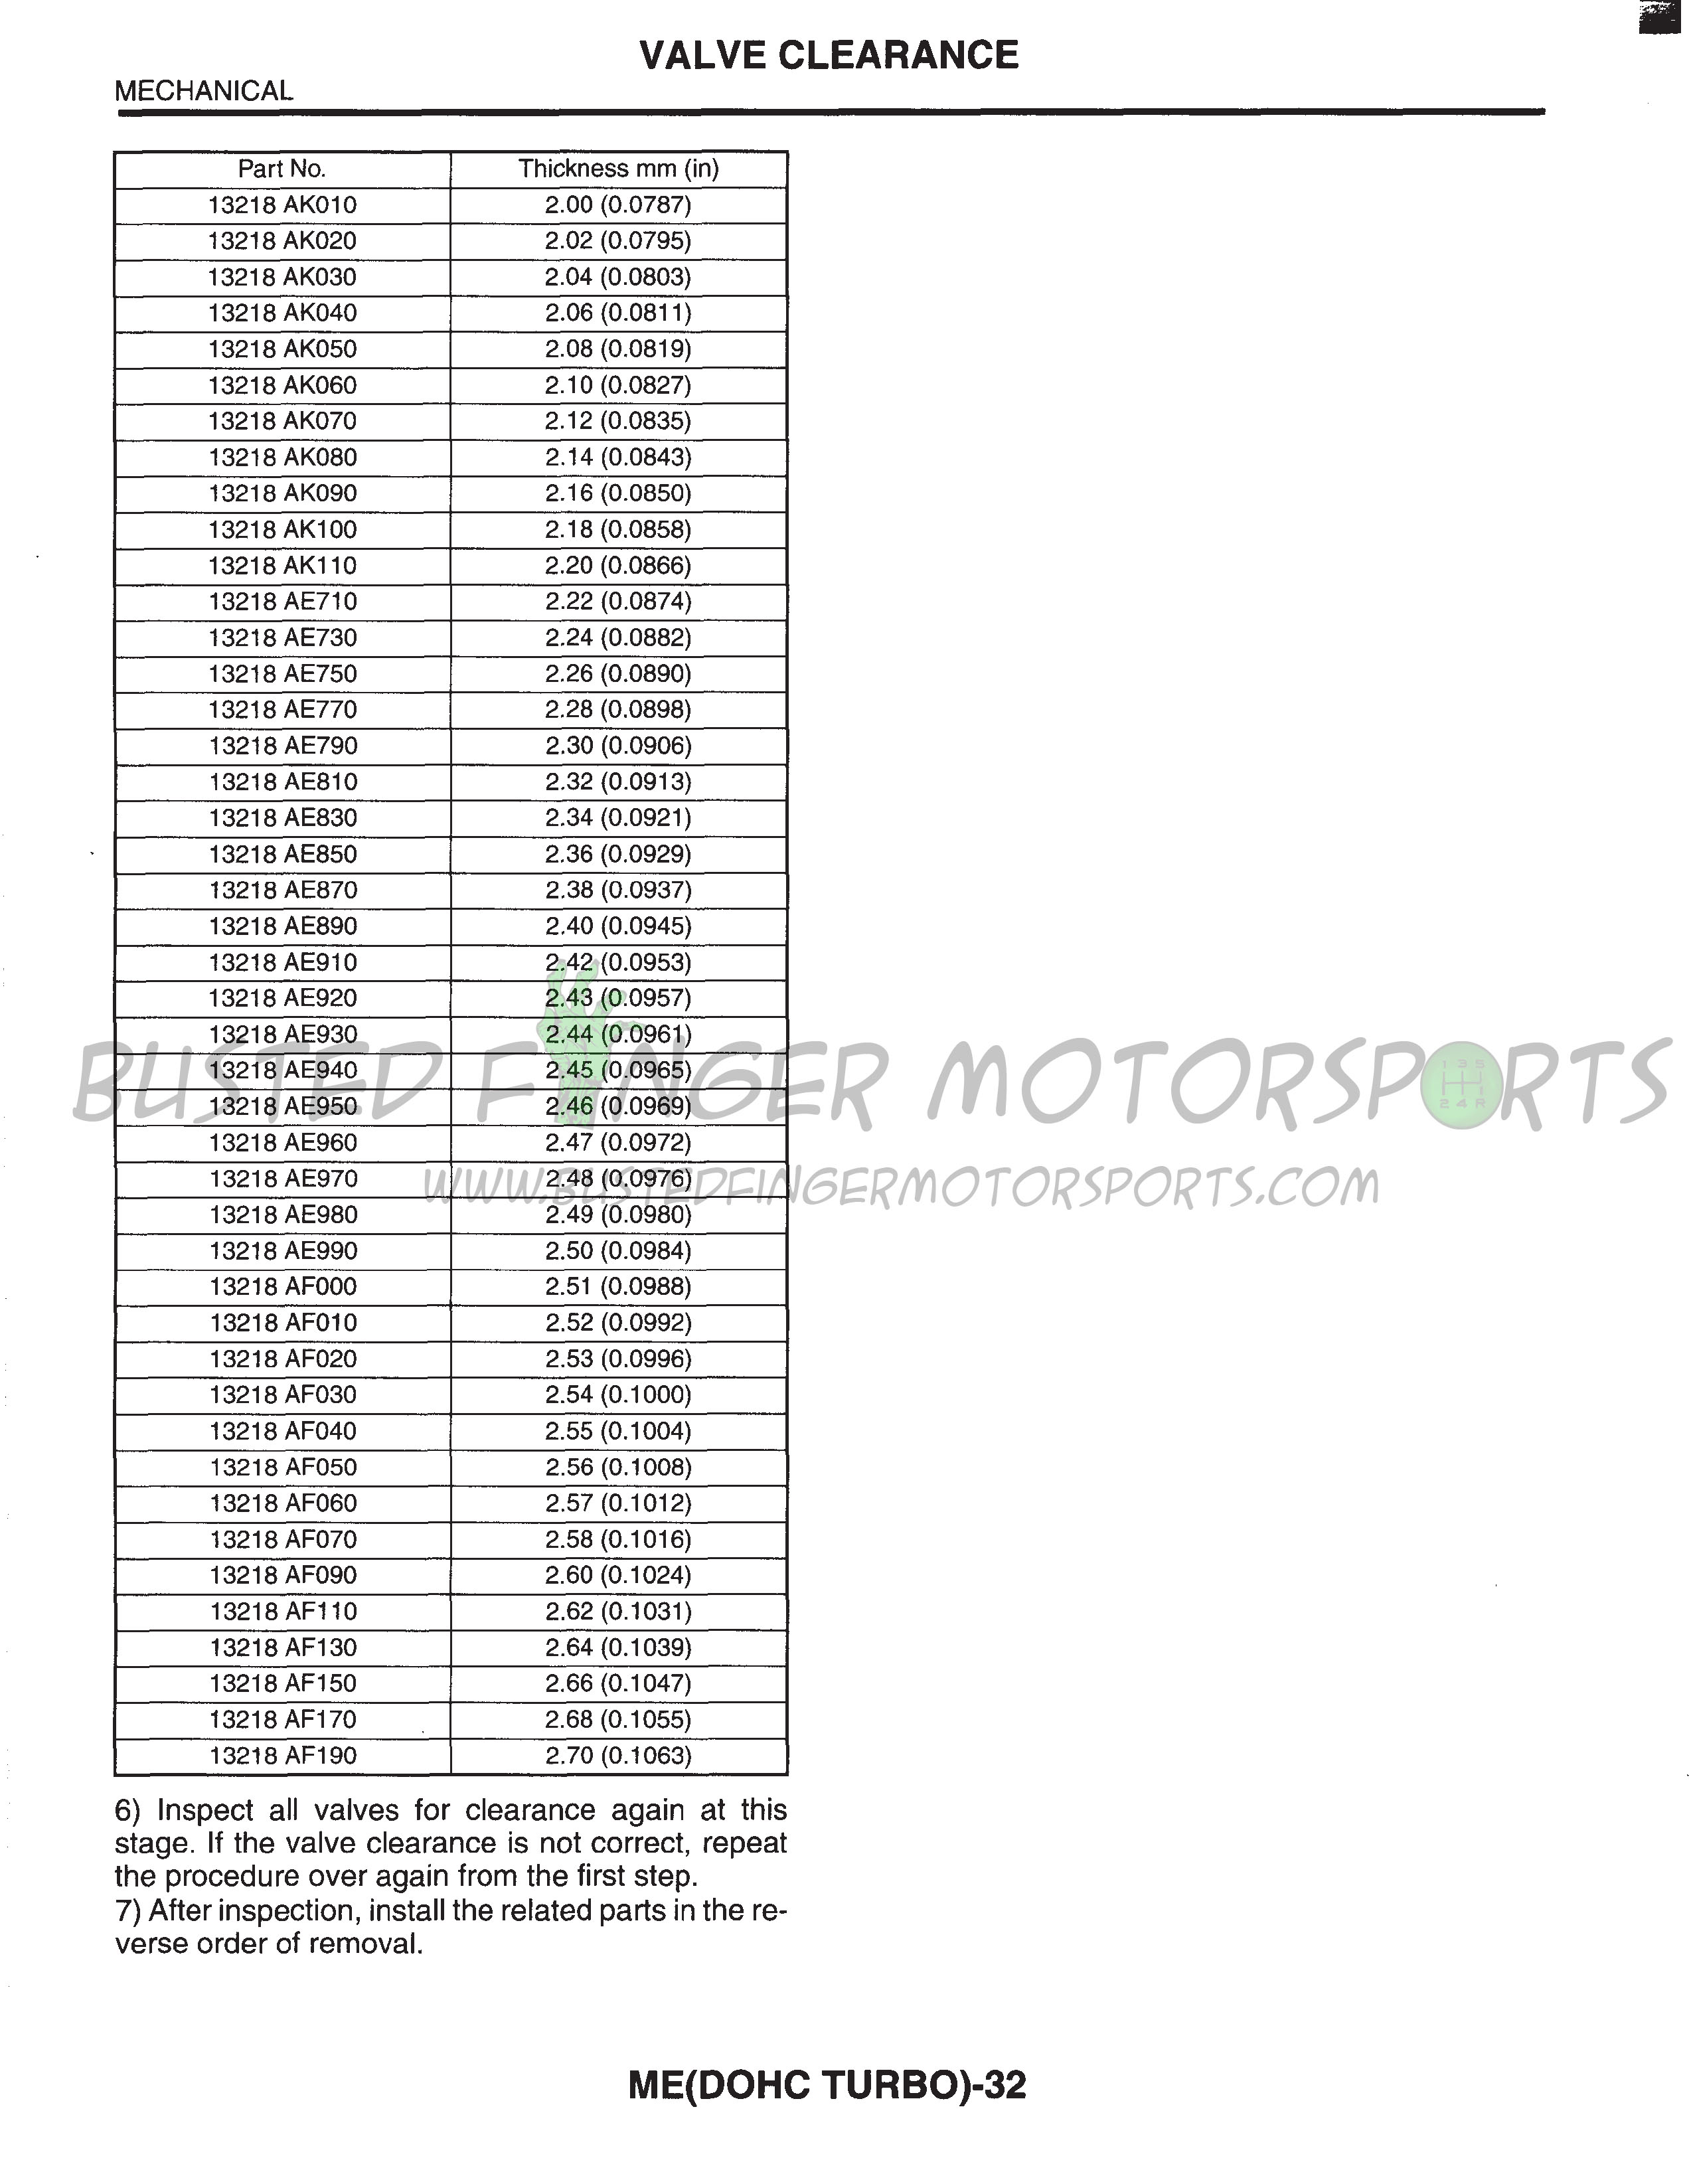 2002 subaru wrx ecu wiring diagram 1995 honda civic forester ej20 engine html